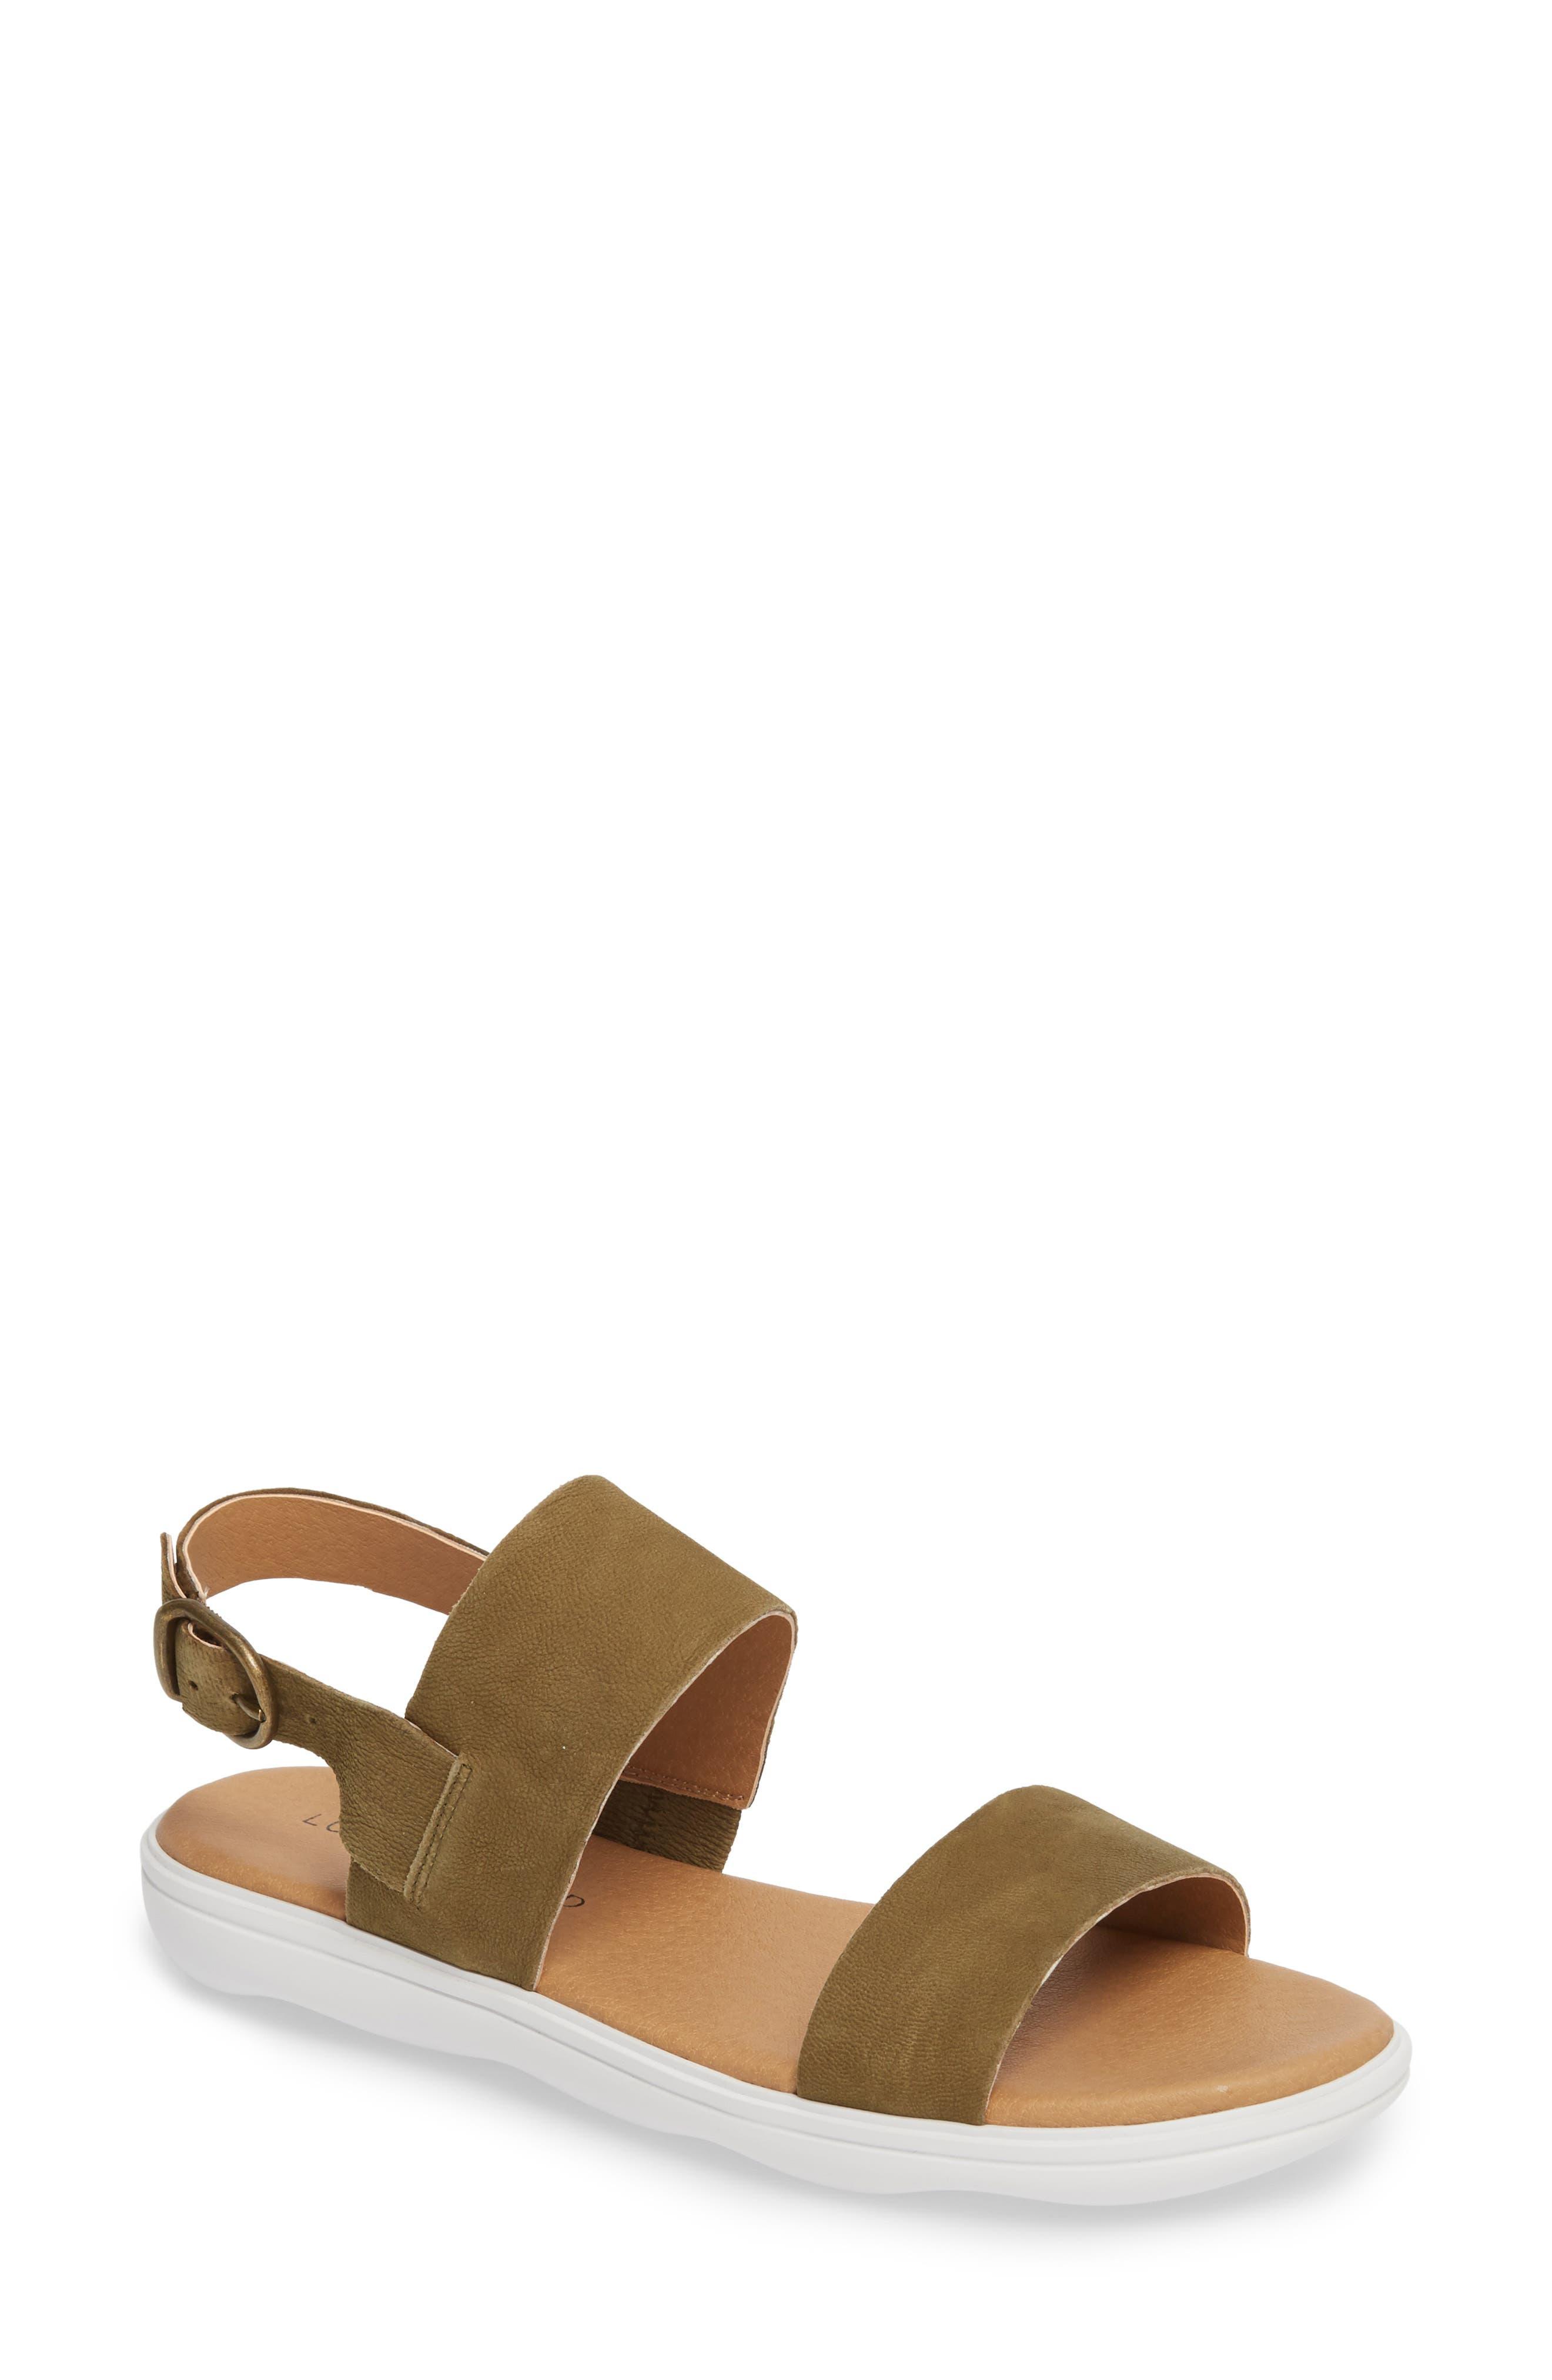 Madgey Sandal,                         Main,                         color, Drab Nubuck Leather